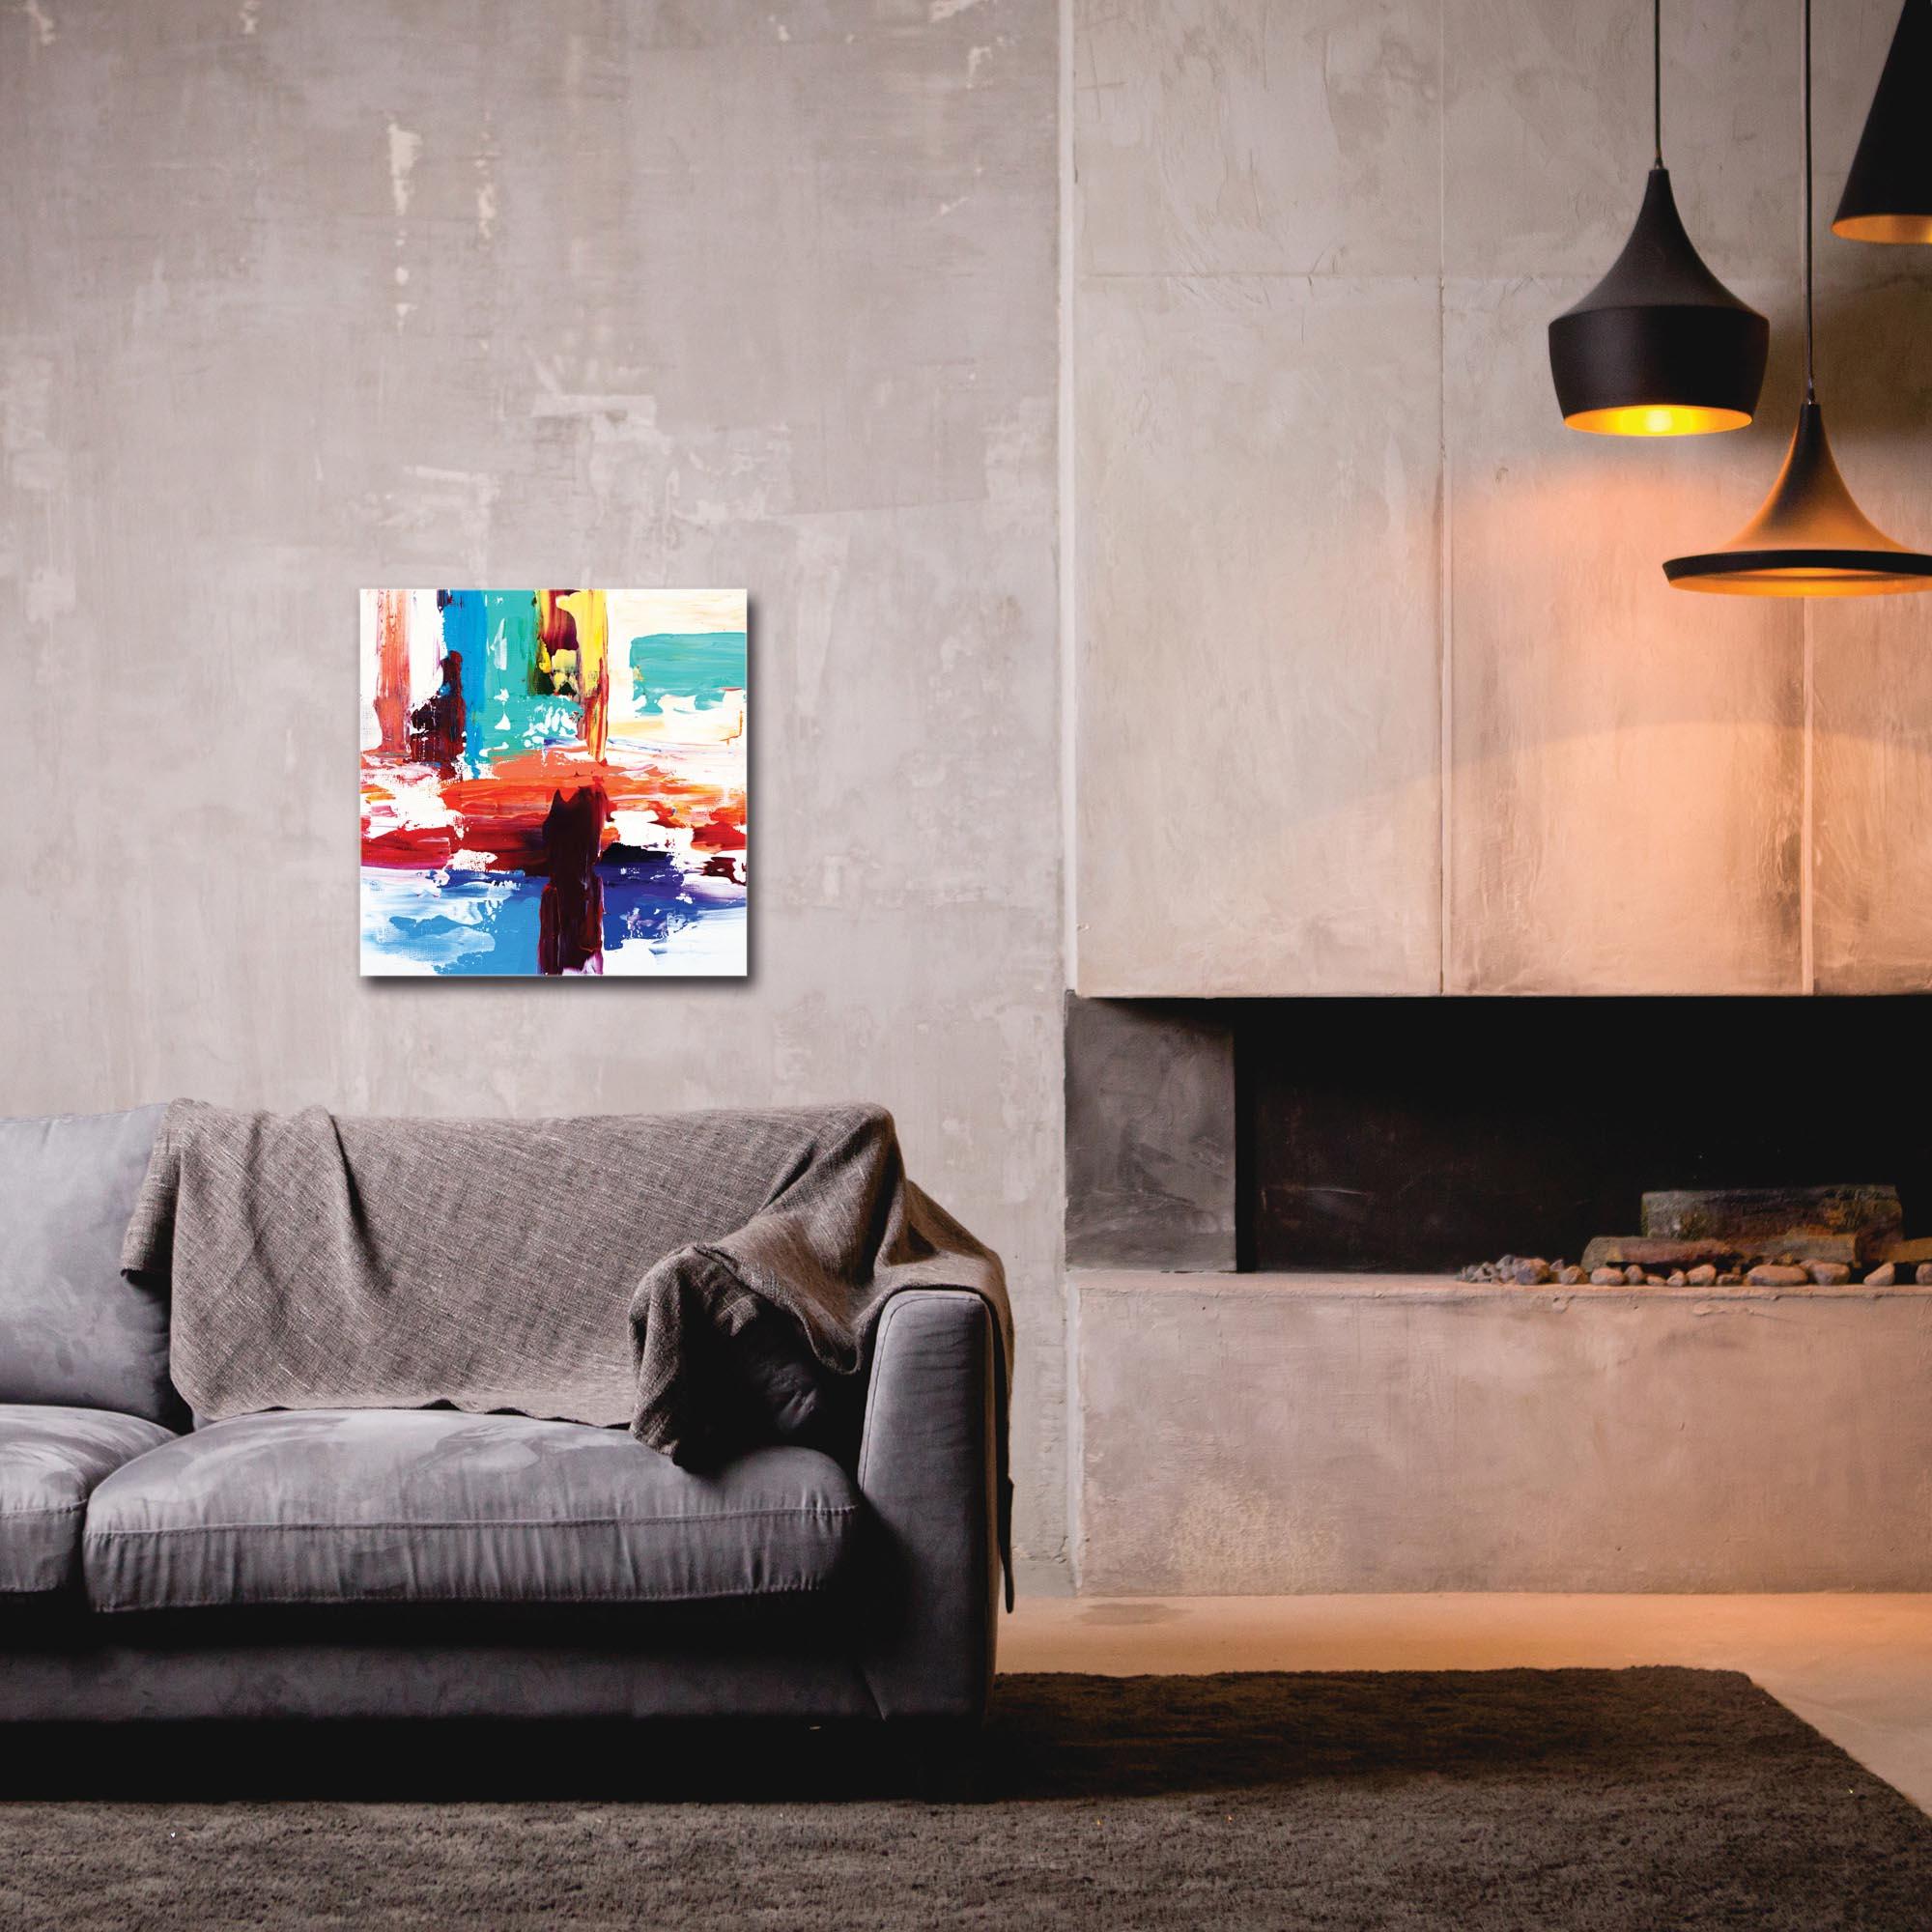 Abstract Wall Art 'Urban Life 3' - Urban Decor on Metal or Plexiglass - Image 3